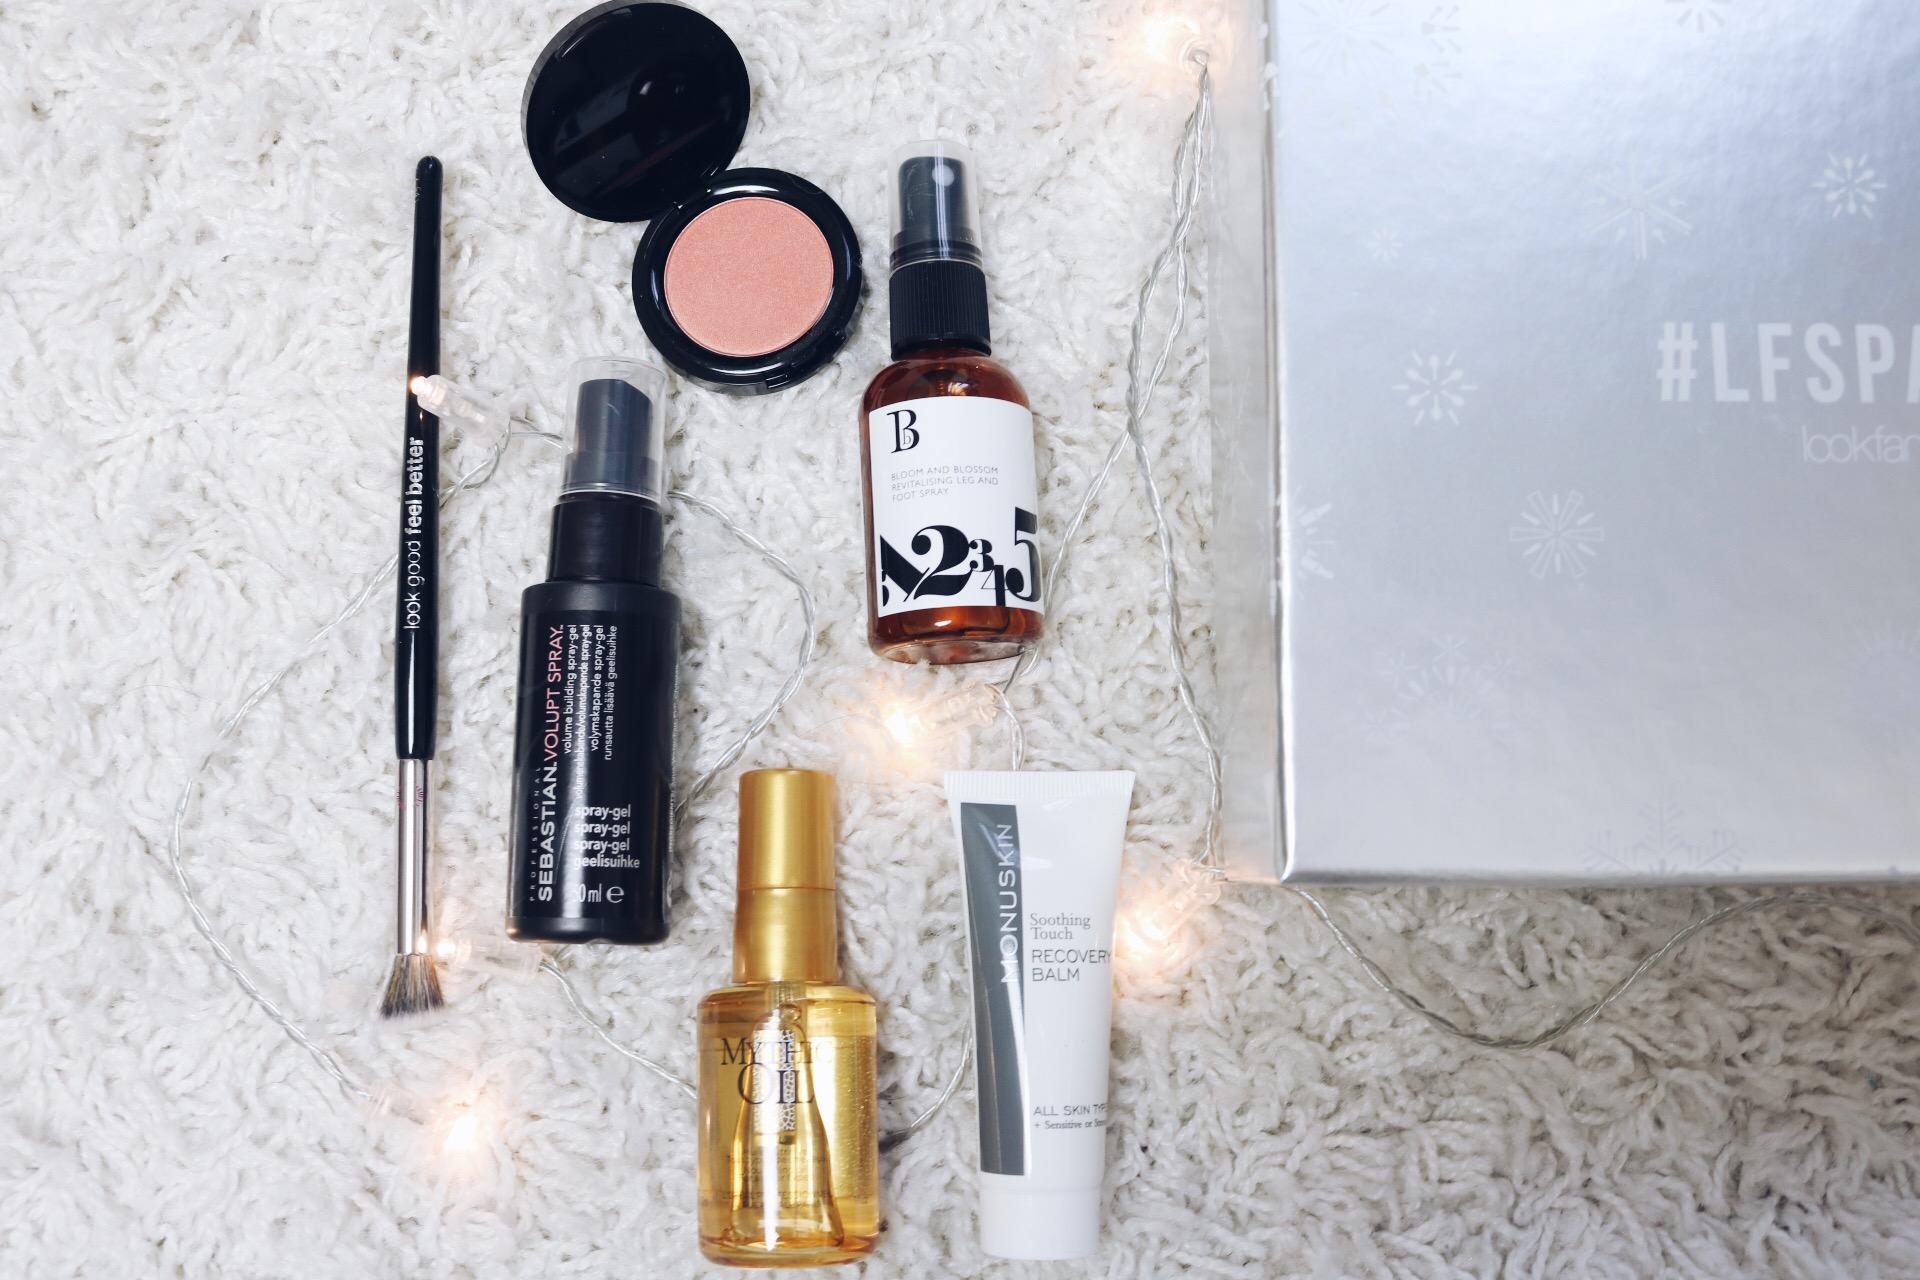 Lookfantastic November skönhetsbox LFSparkle amandahans skönhetsblogg skönhetsbloggare prenumerationsbox glossy box lookfantastic.se bästa amanda